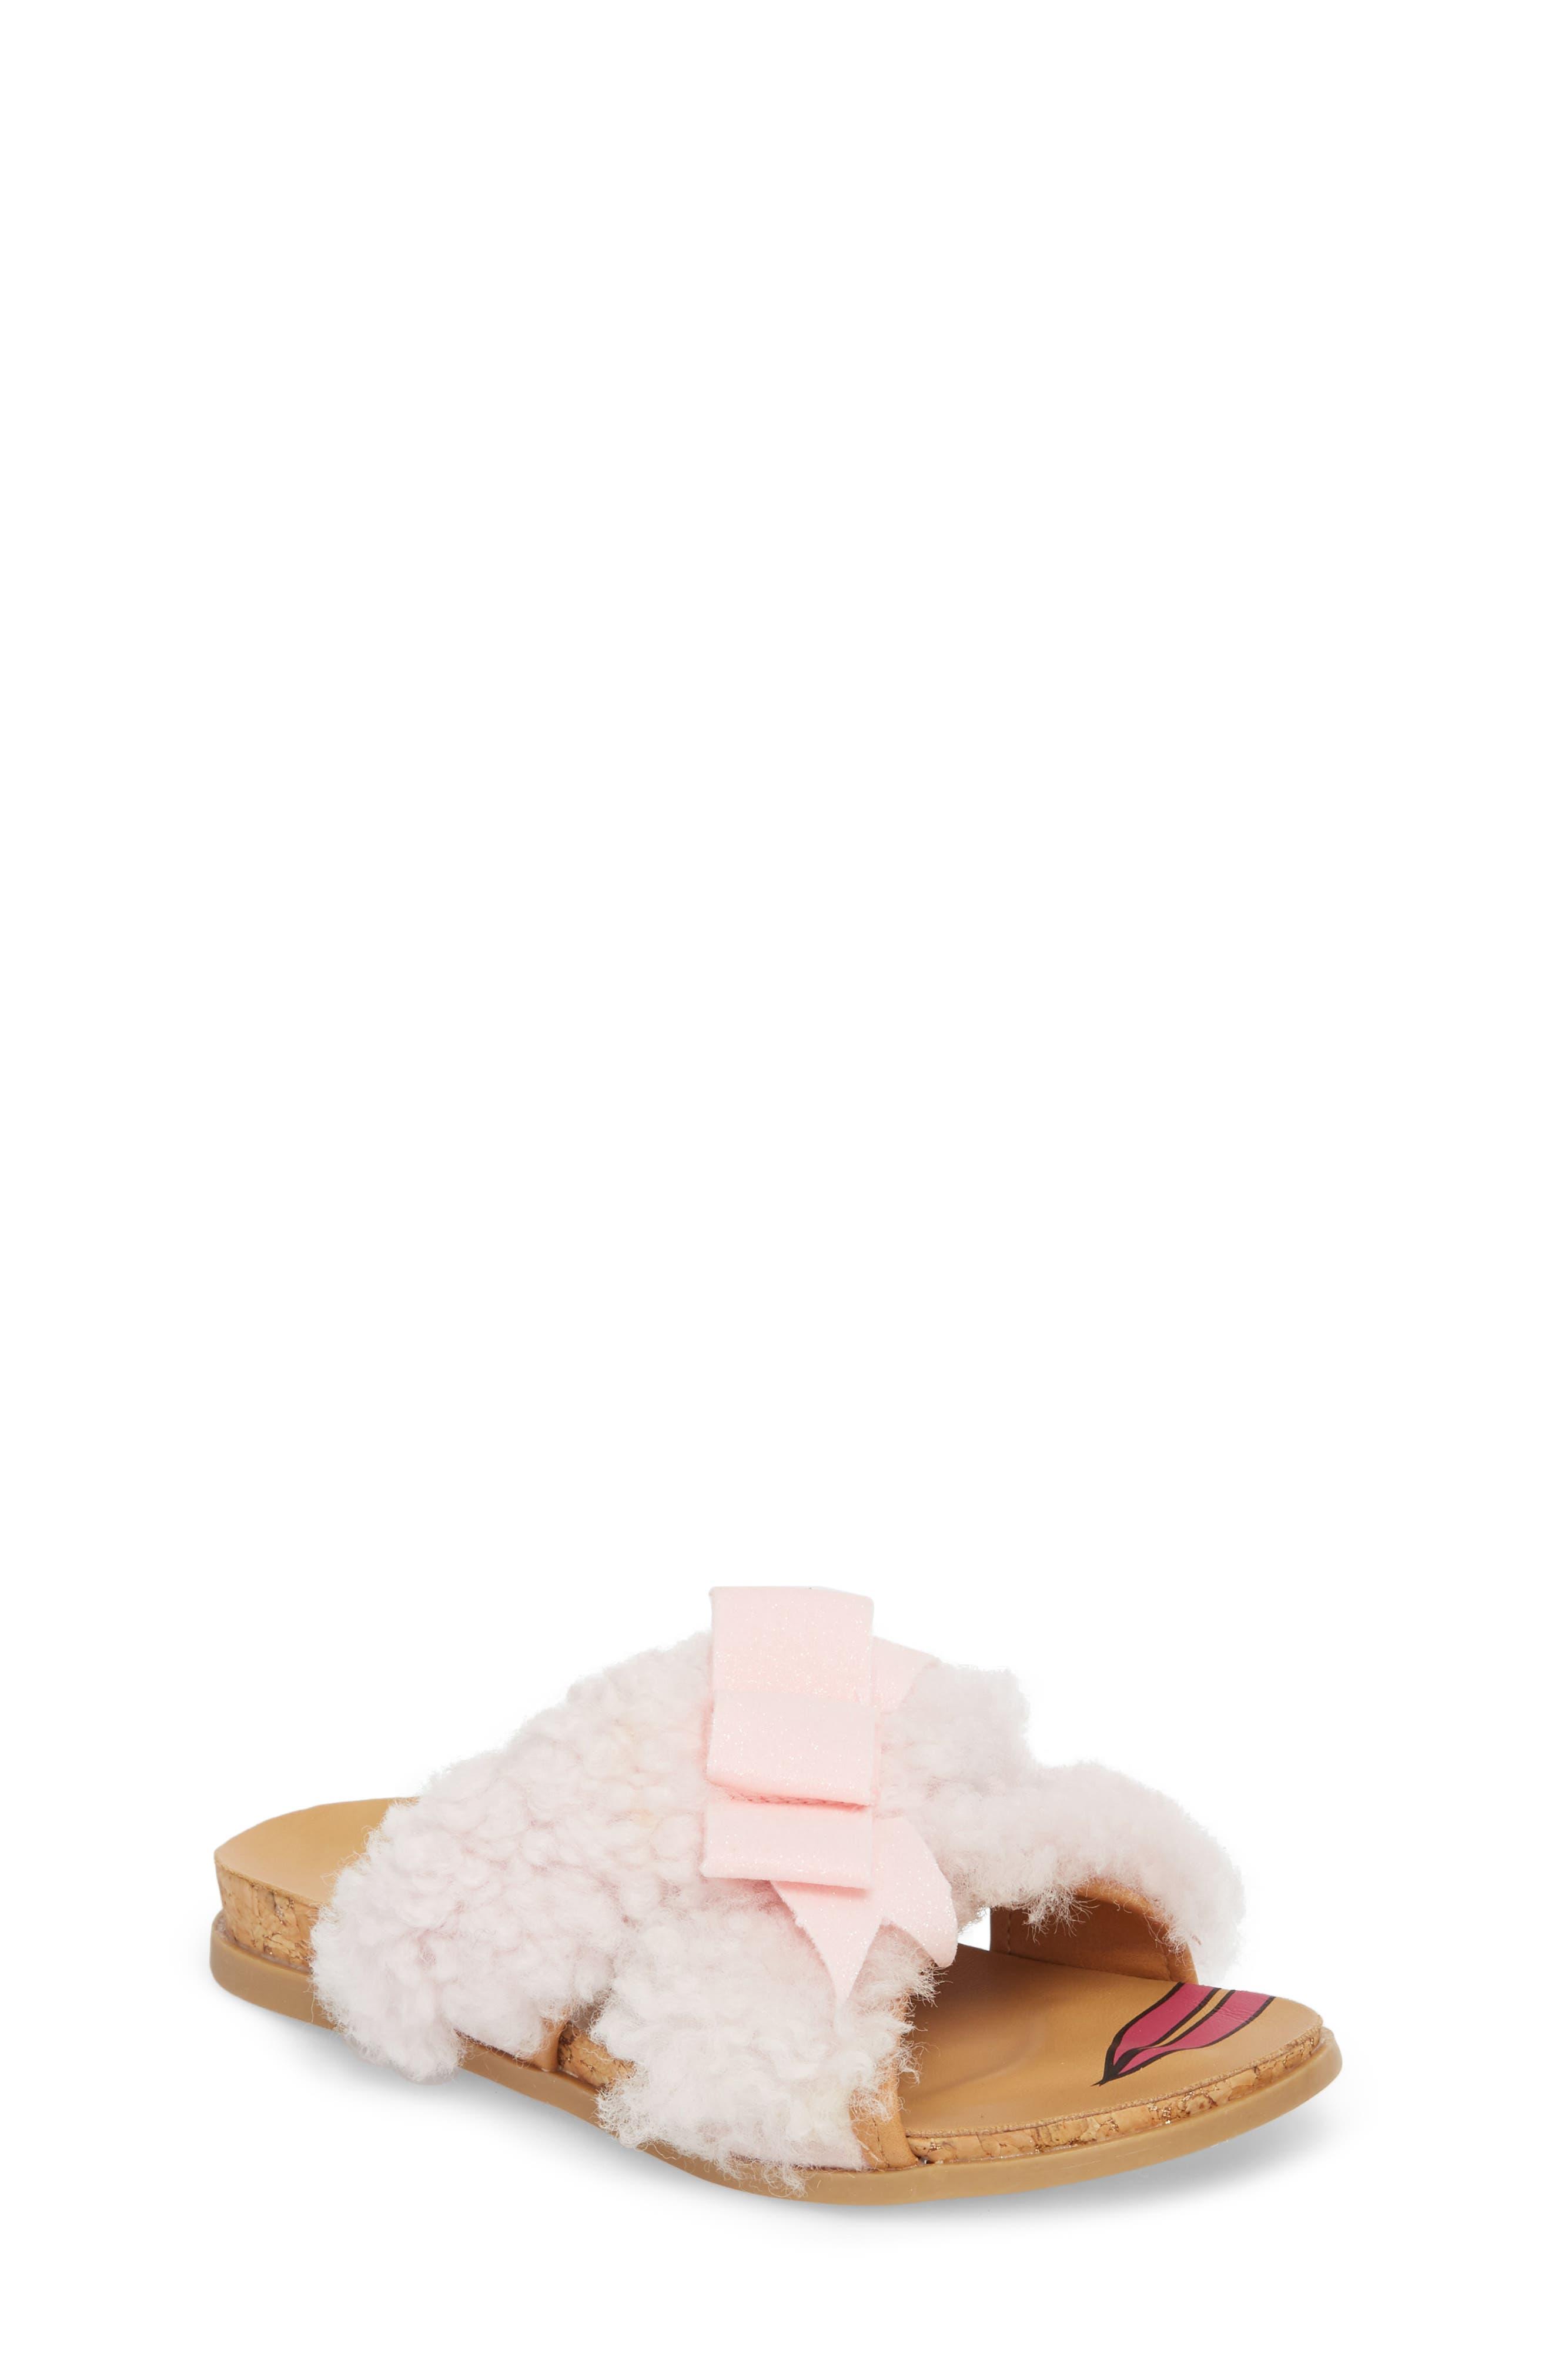 Staceee Genuine Shearling Slide Sandal,                             Main thumbnail 1, color,                             Seashell Pink